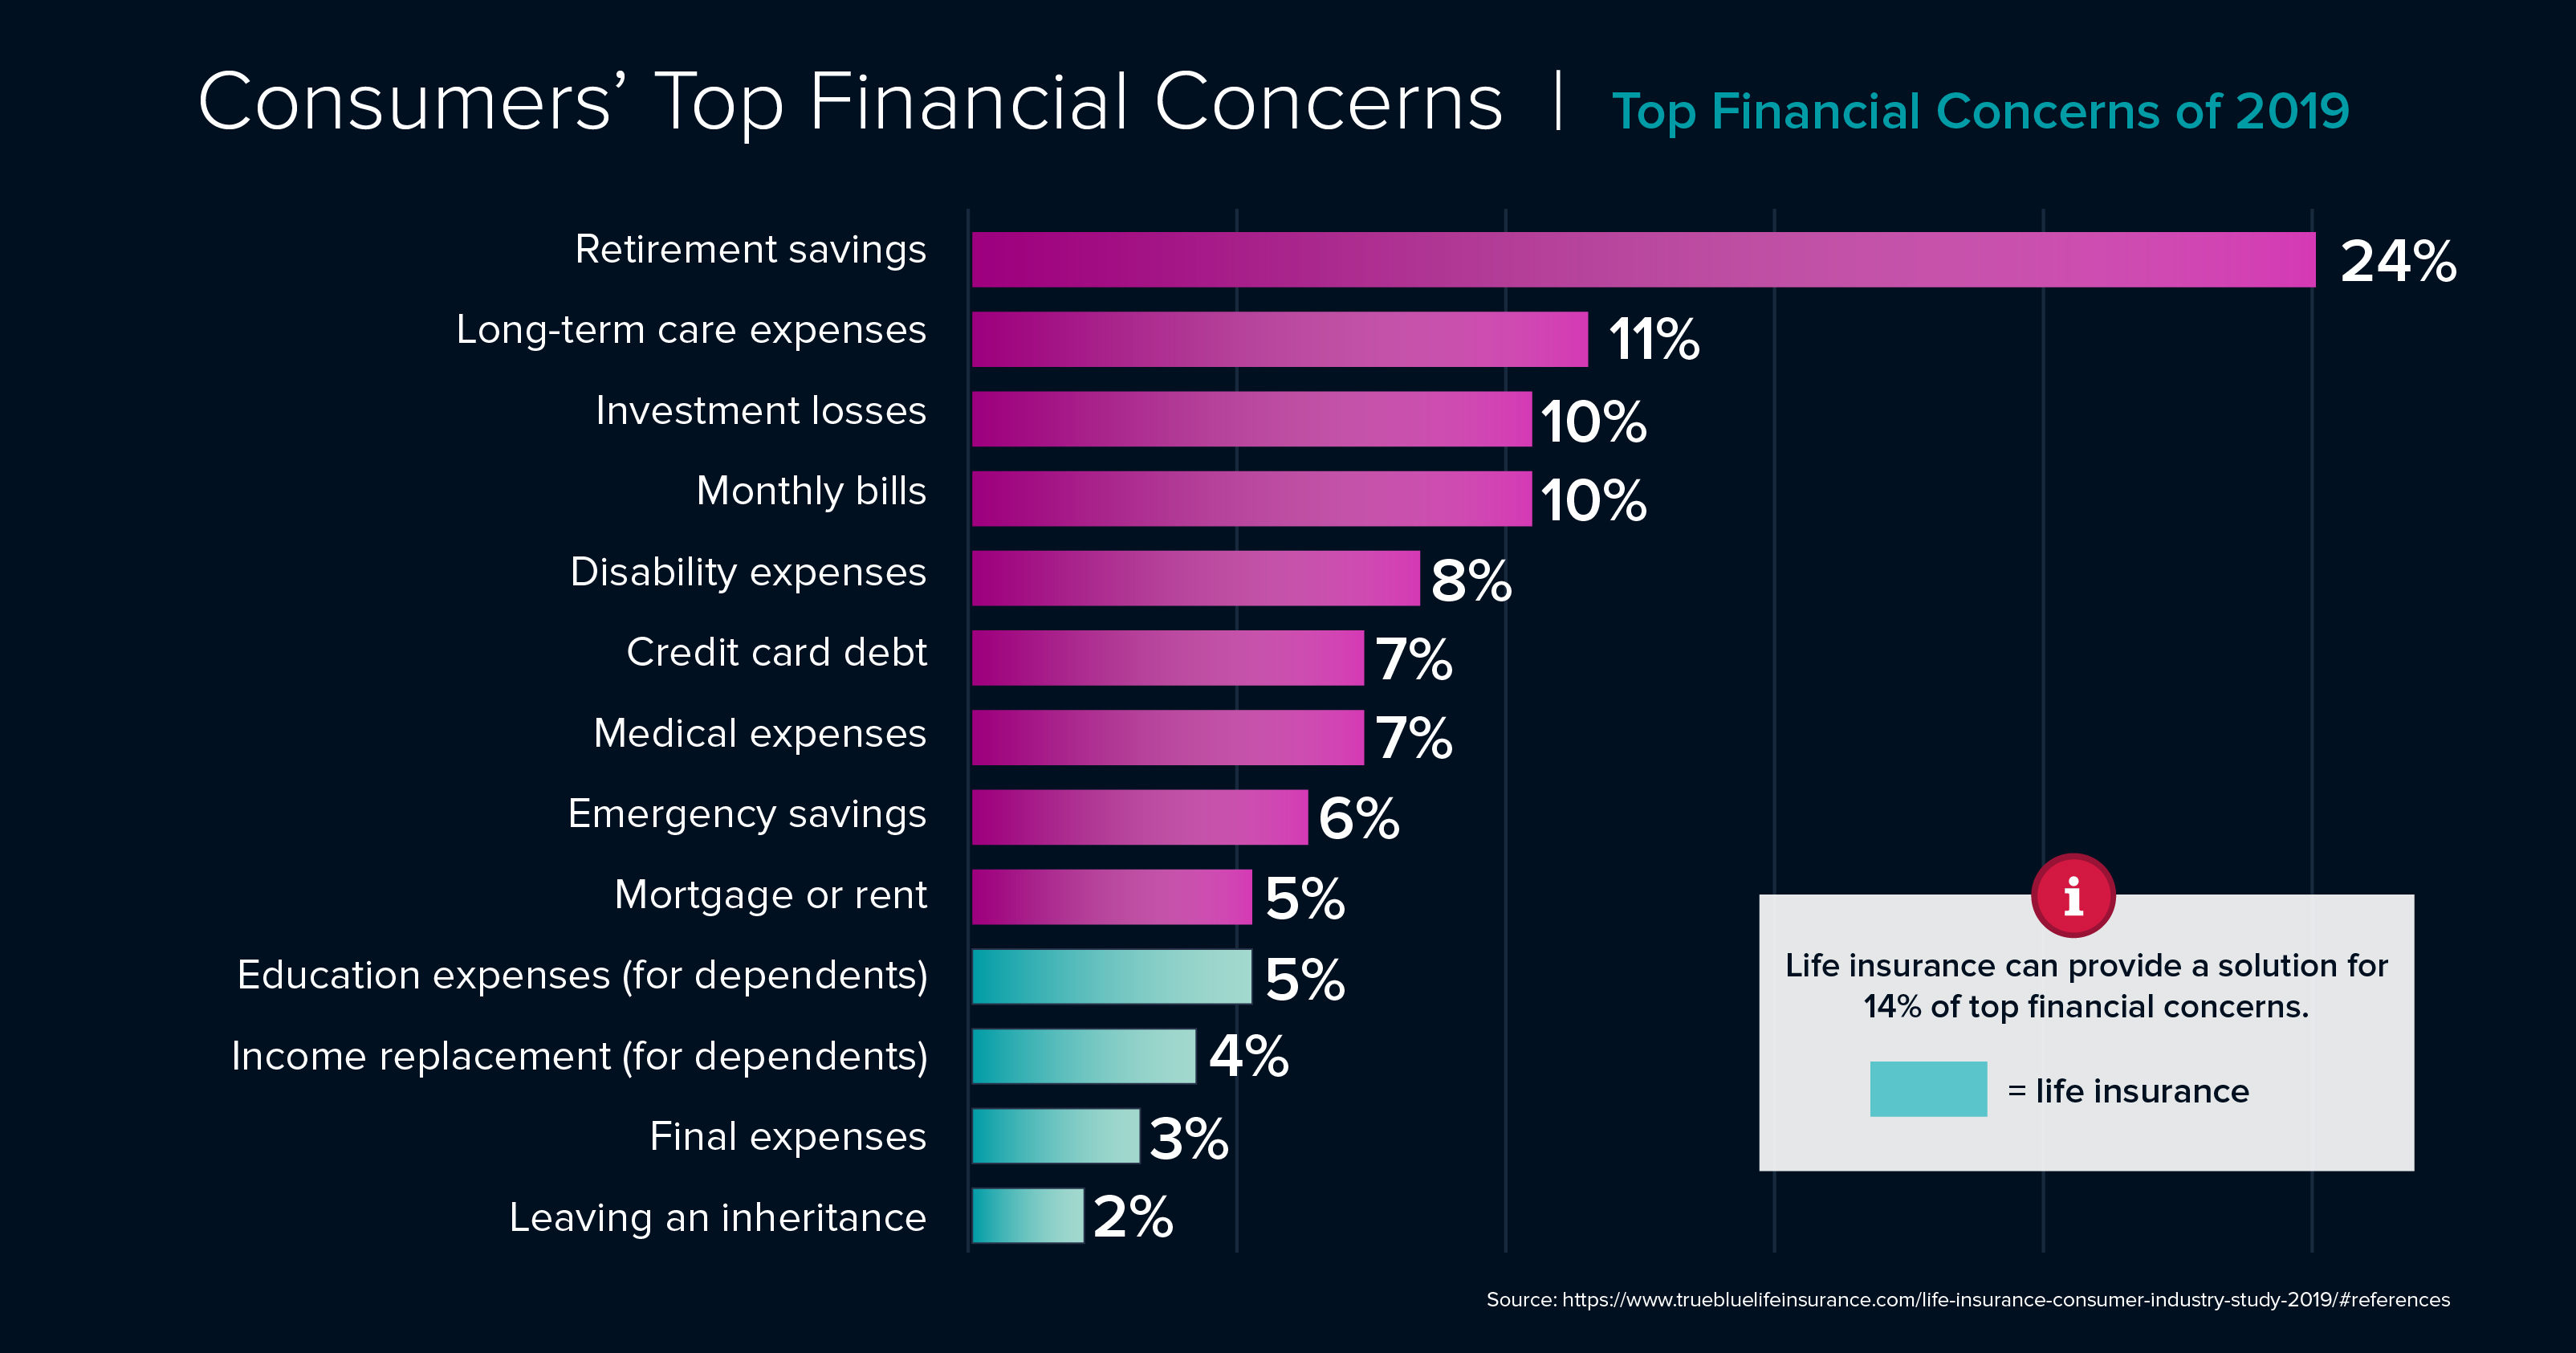 Surprising_Life_Insurance_TOP_FINANCIAL_CONCERNS